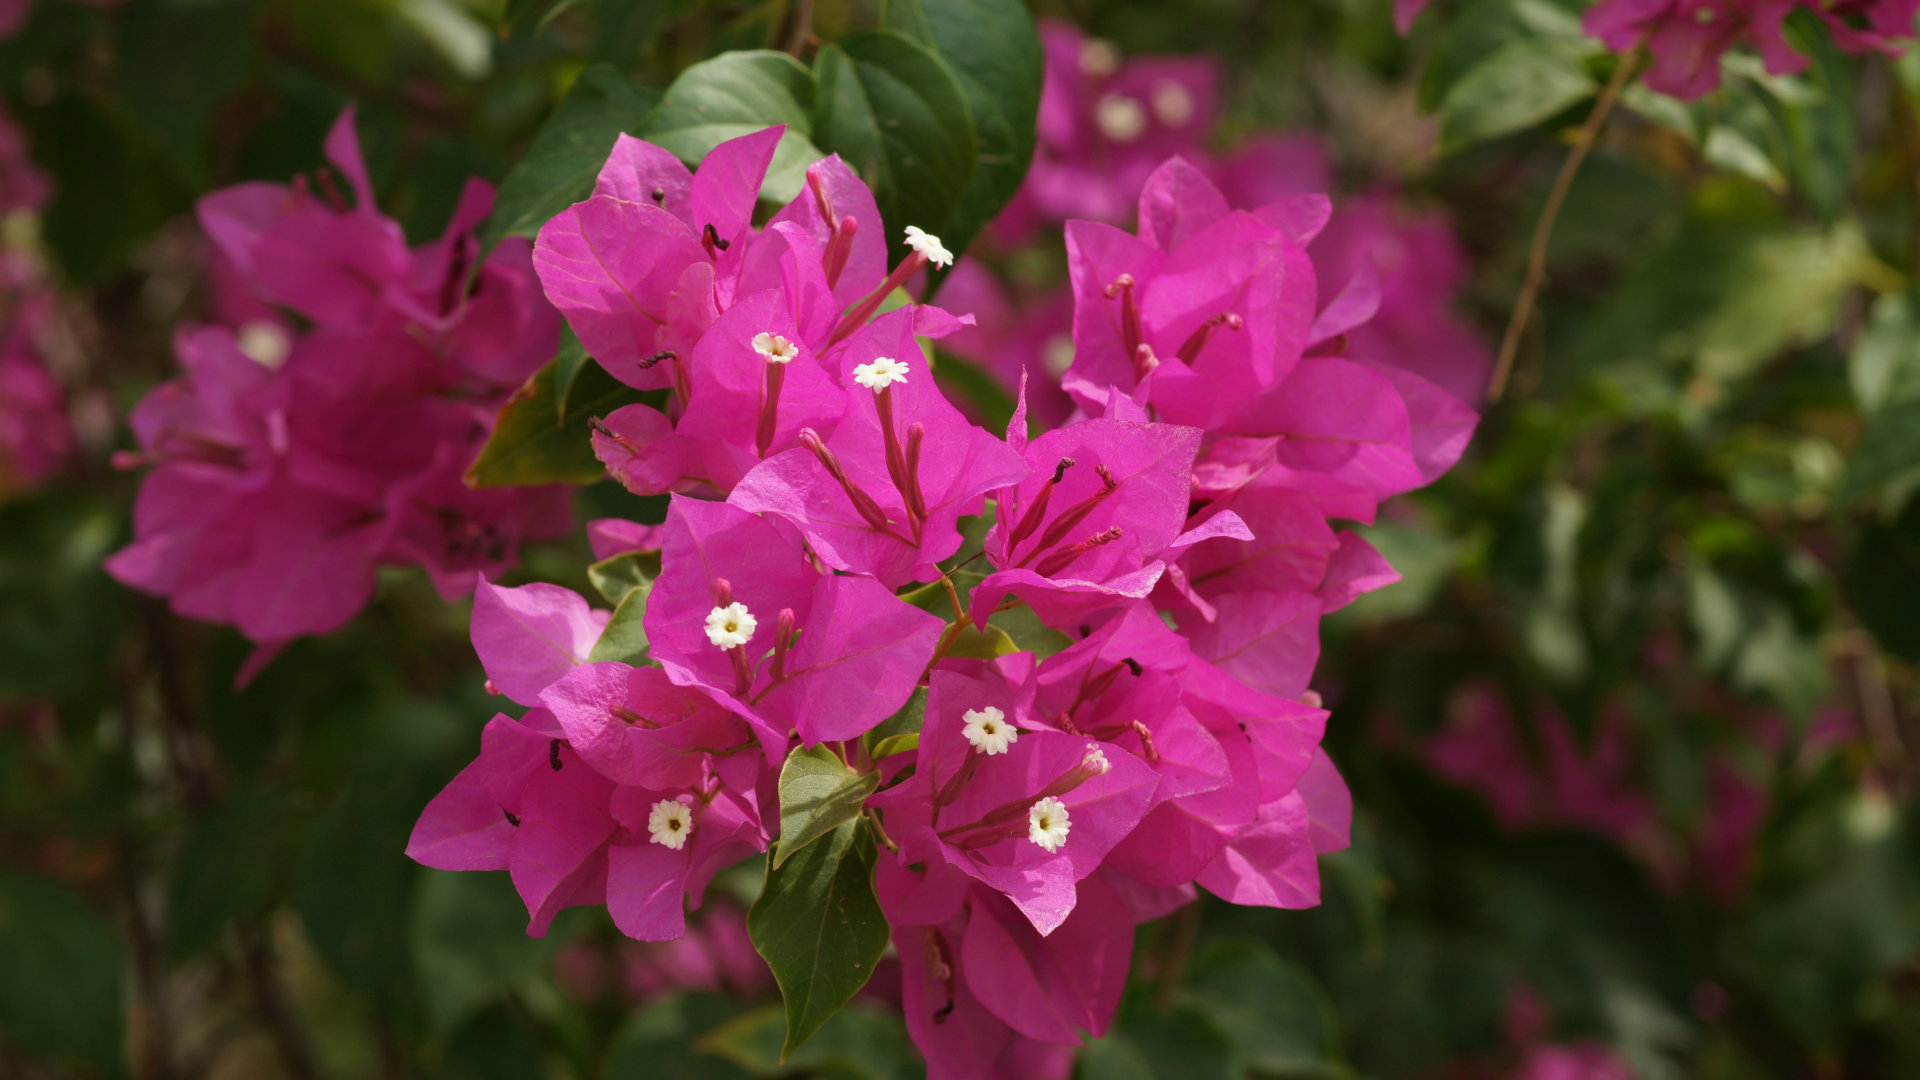 Pink Bougainvillea Flowers 20215 1344x896 px